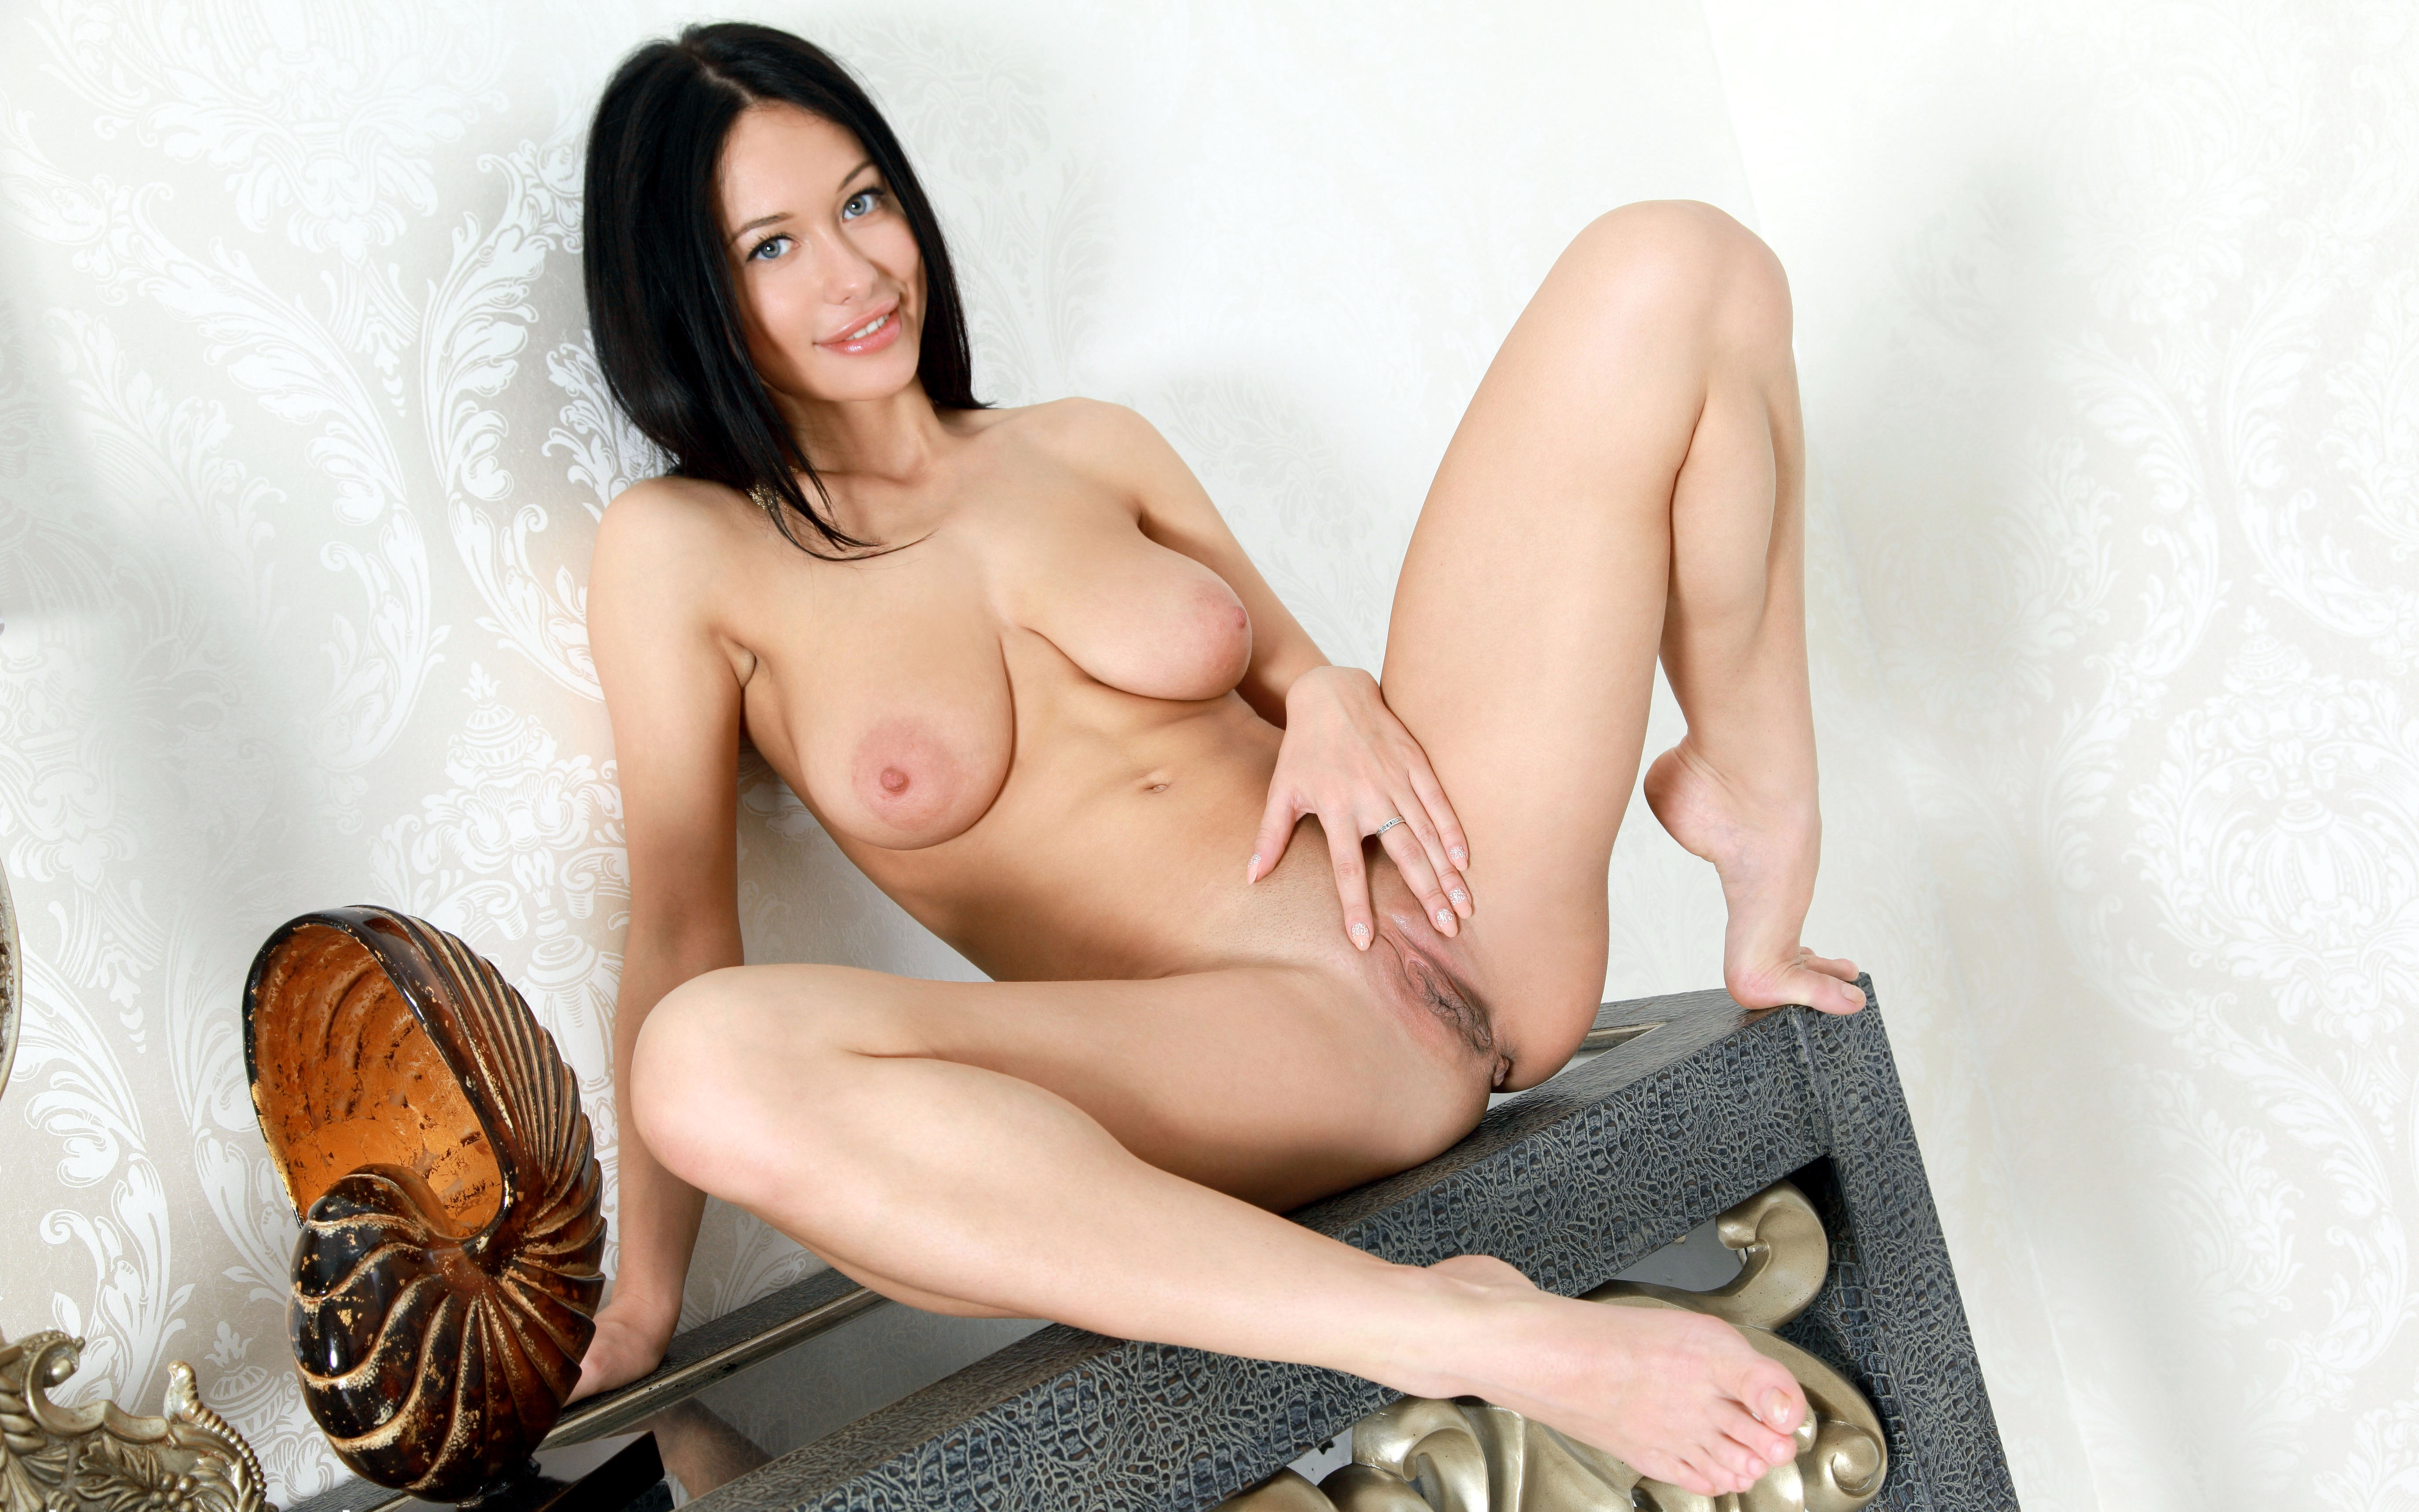 Nude women spread pussy free will